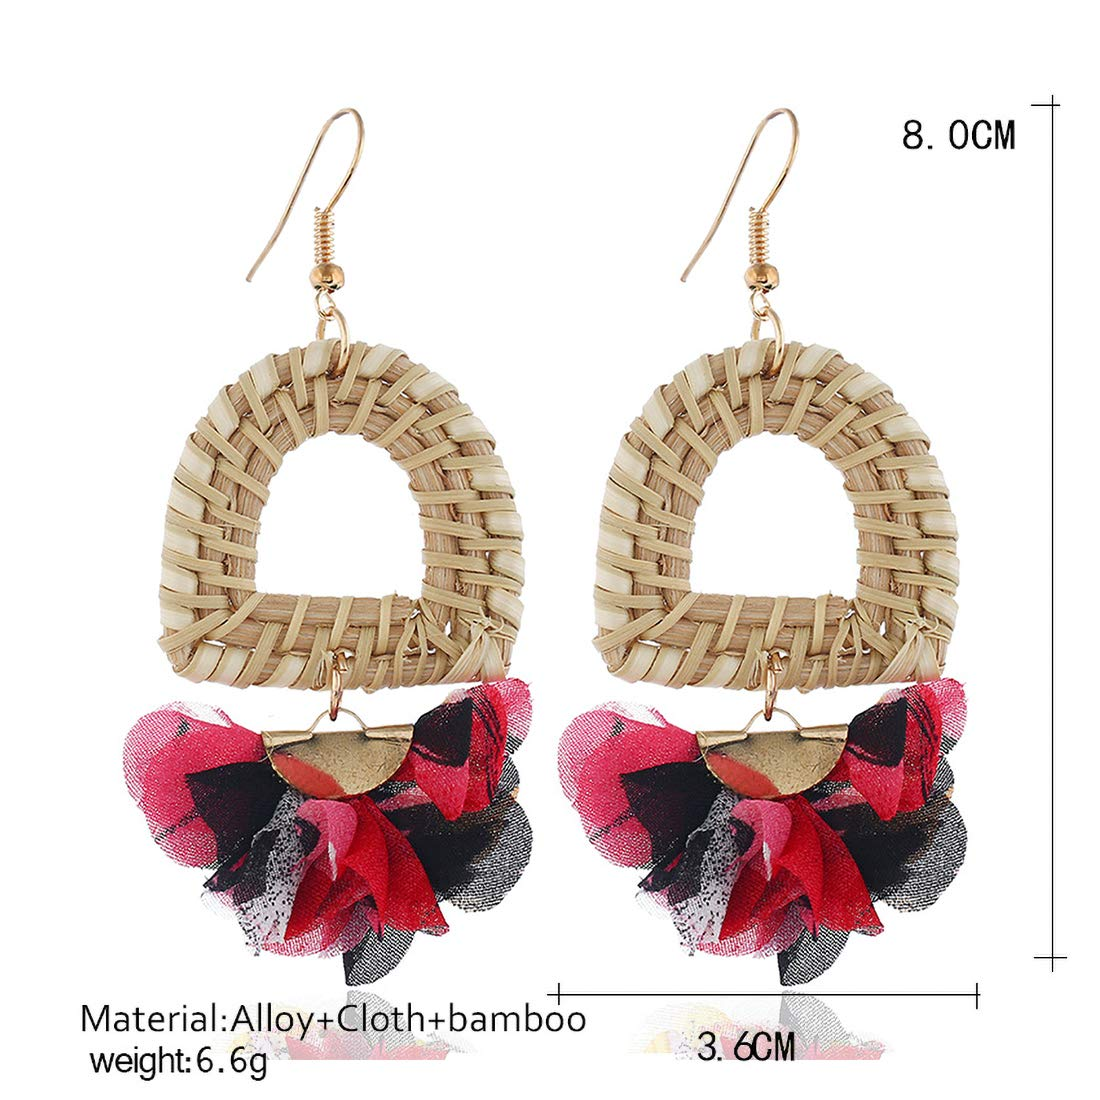 Handmade Bamboo Earrings Great Gifts for Women Girls JXVLUYE Charm Earring for Women Girls